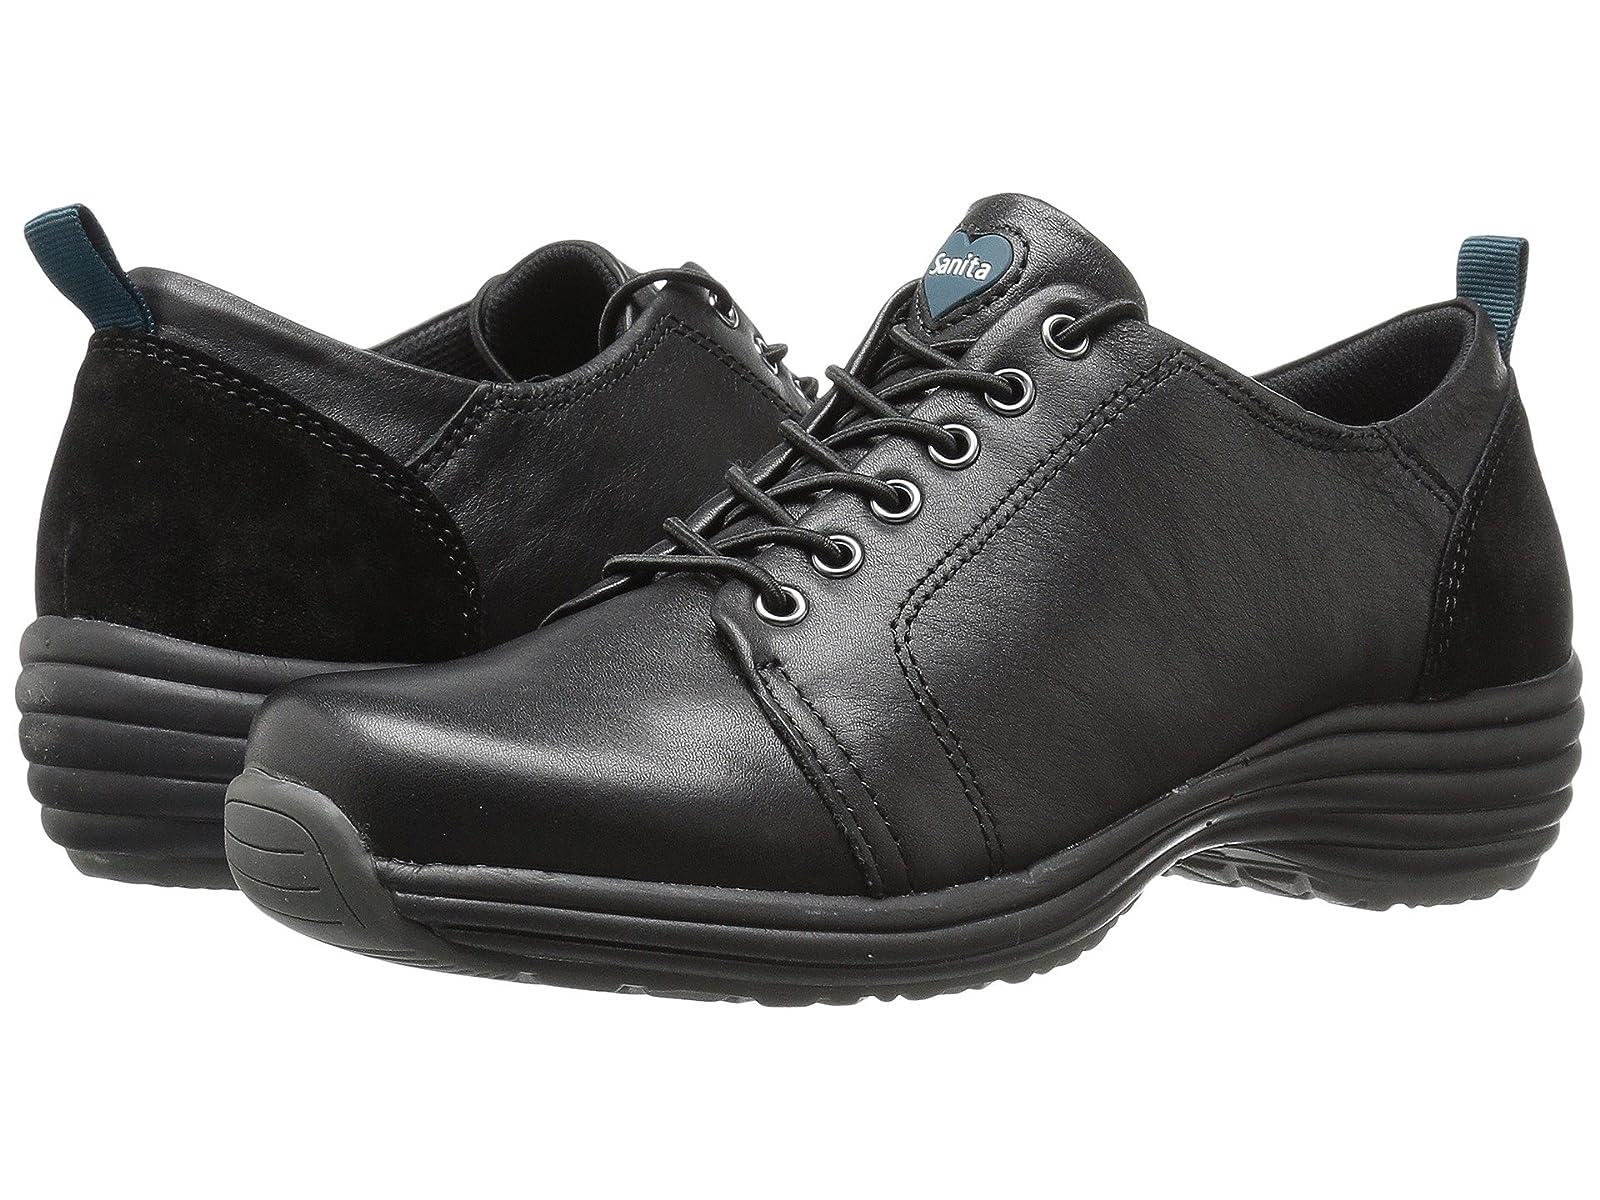 Sanita Prosper LuxeCheap and distinctive eye-catching shoes